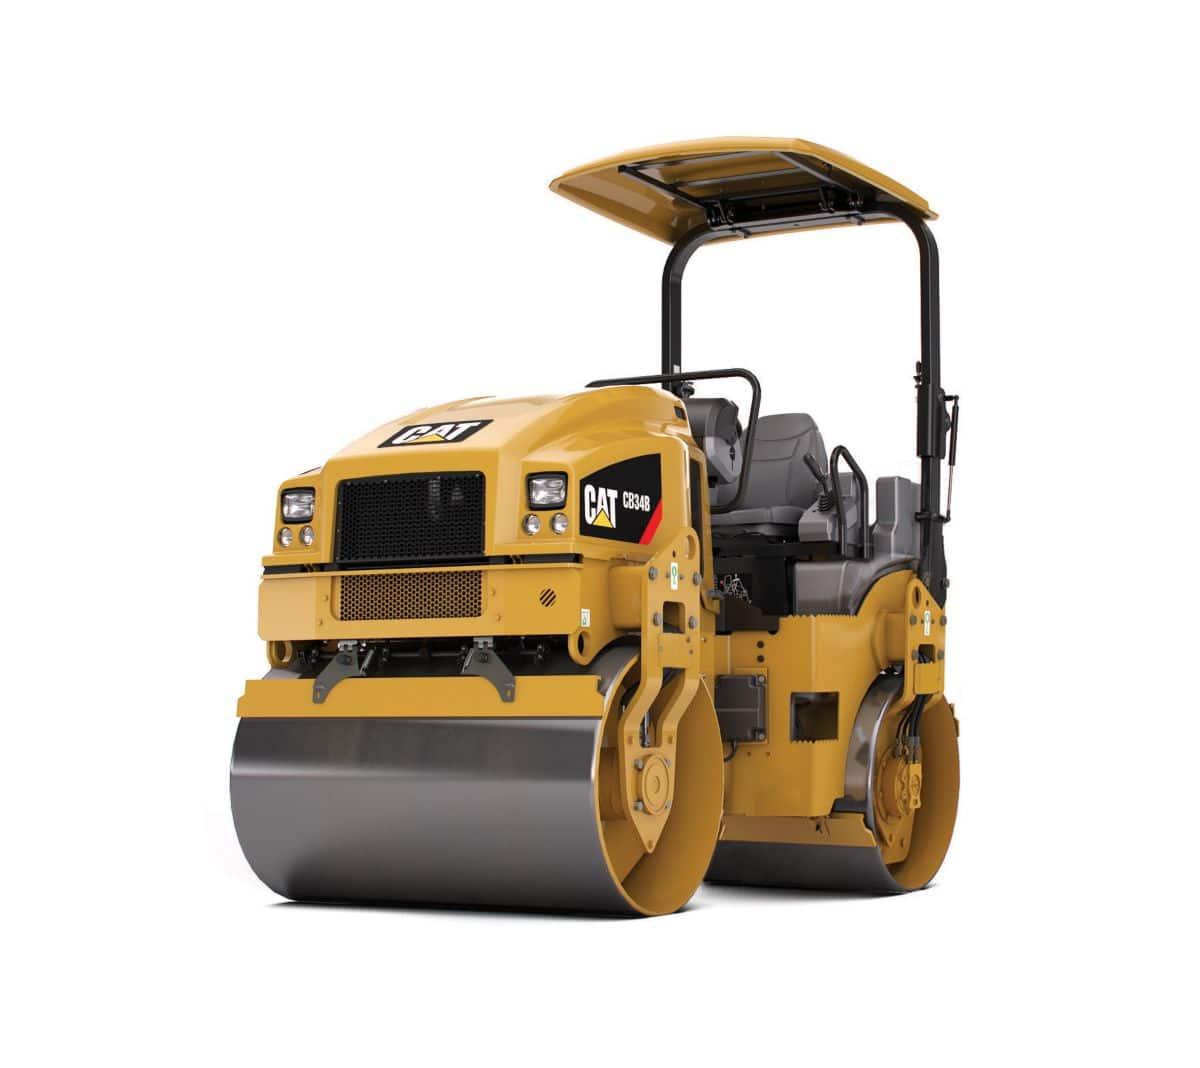 Rodillo 2800 kg Caterpillar CB24B en alquiler